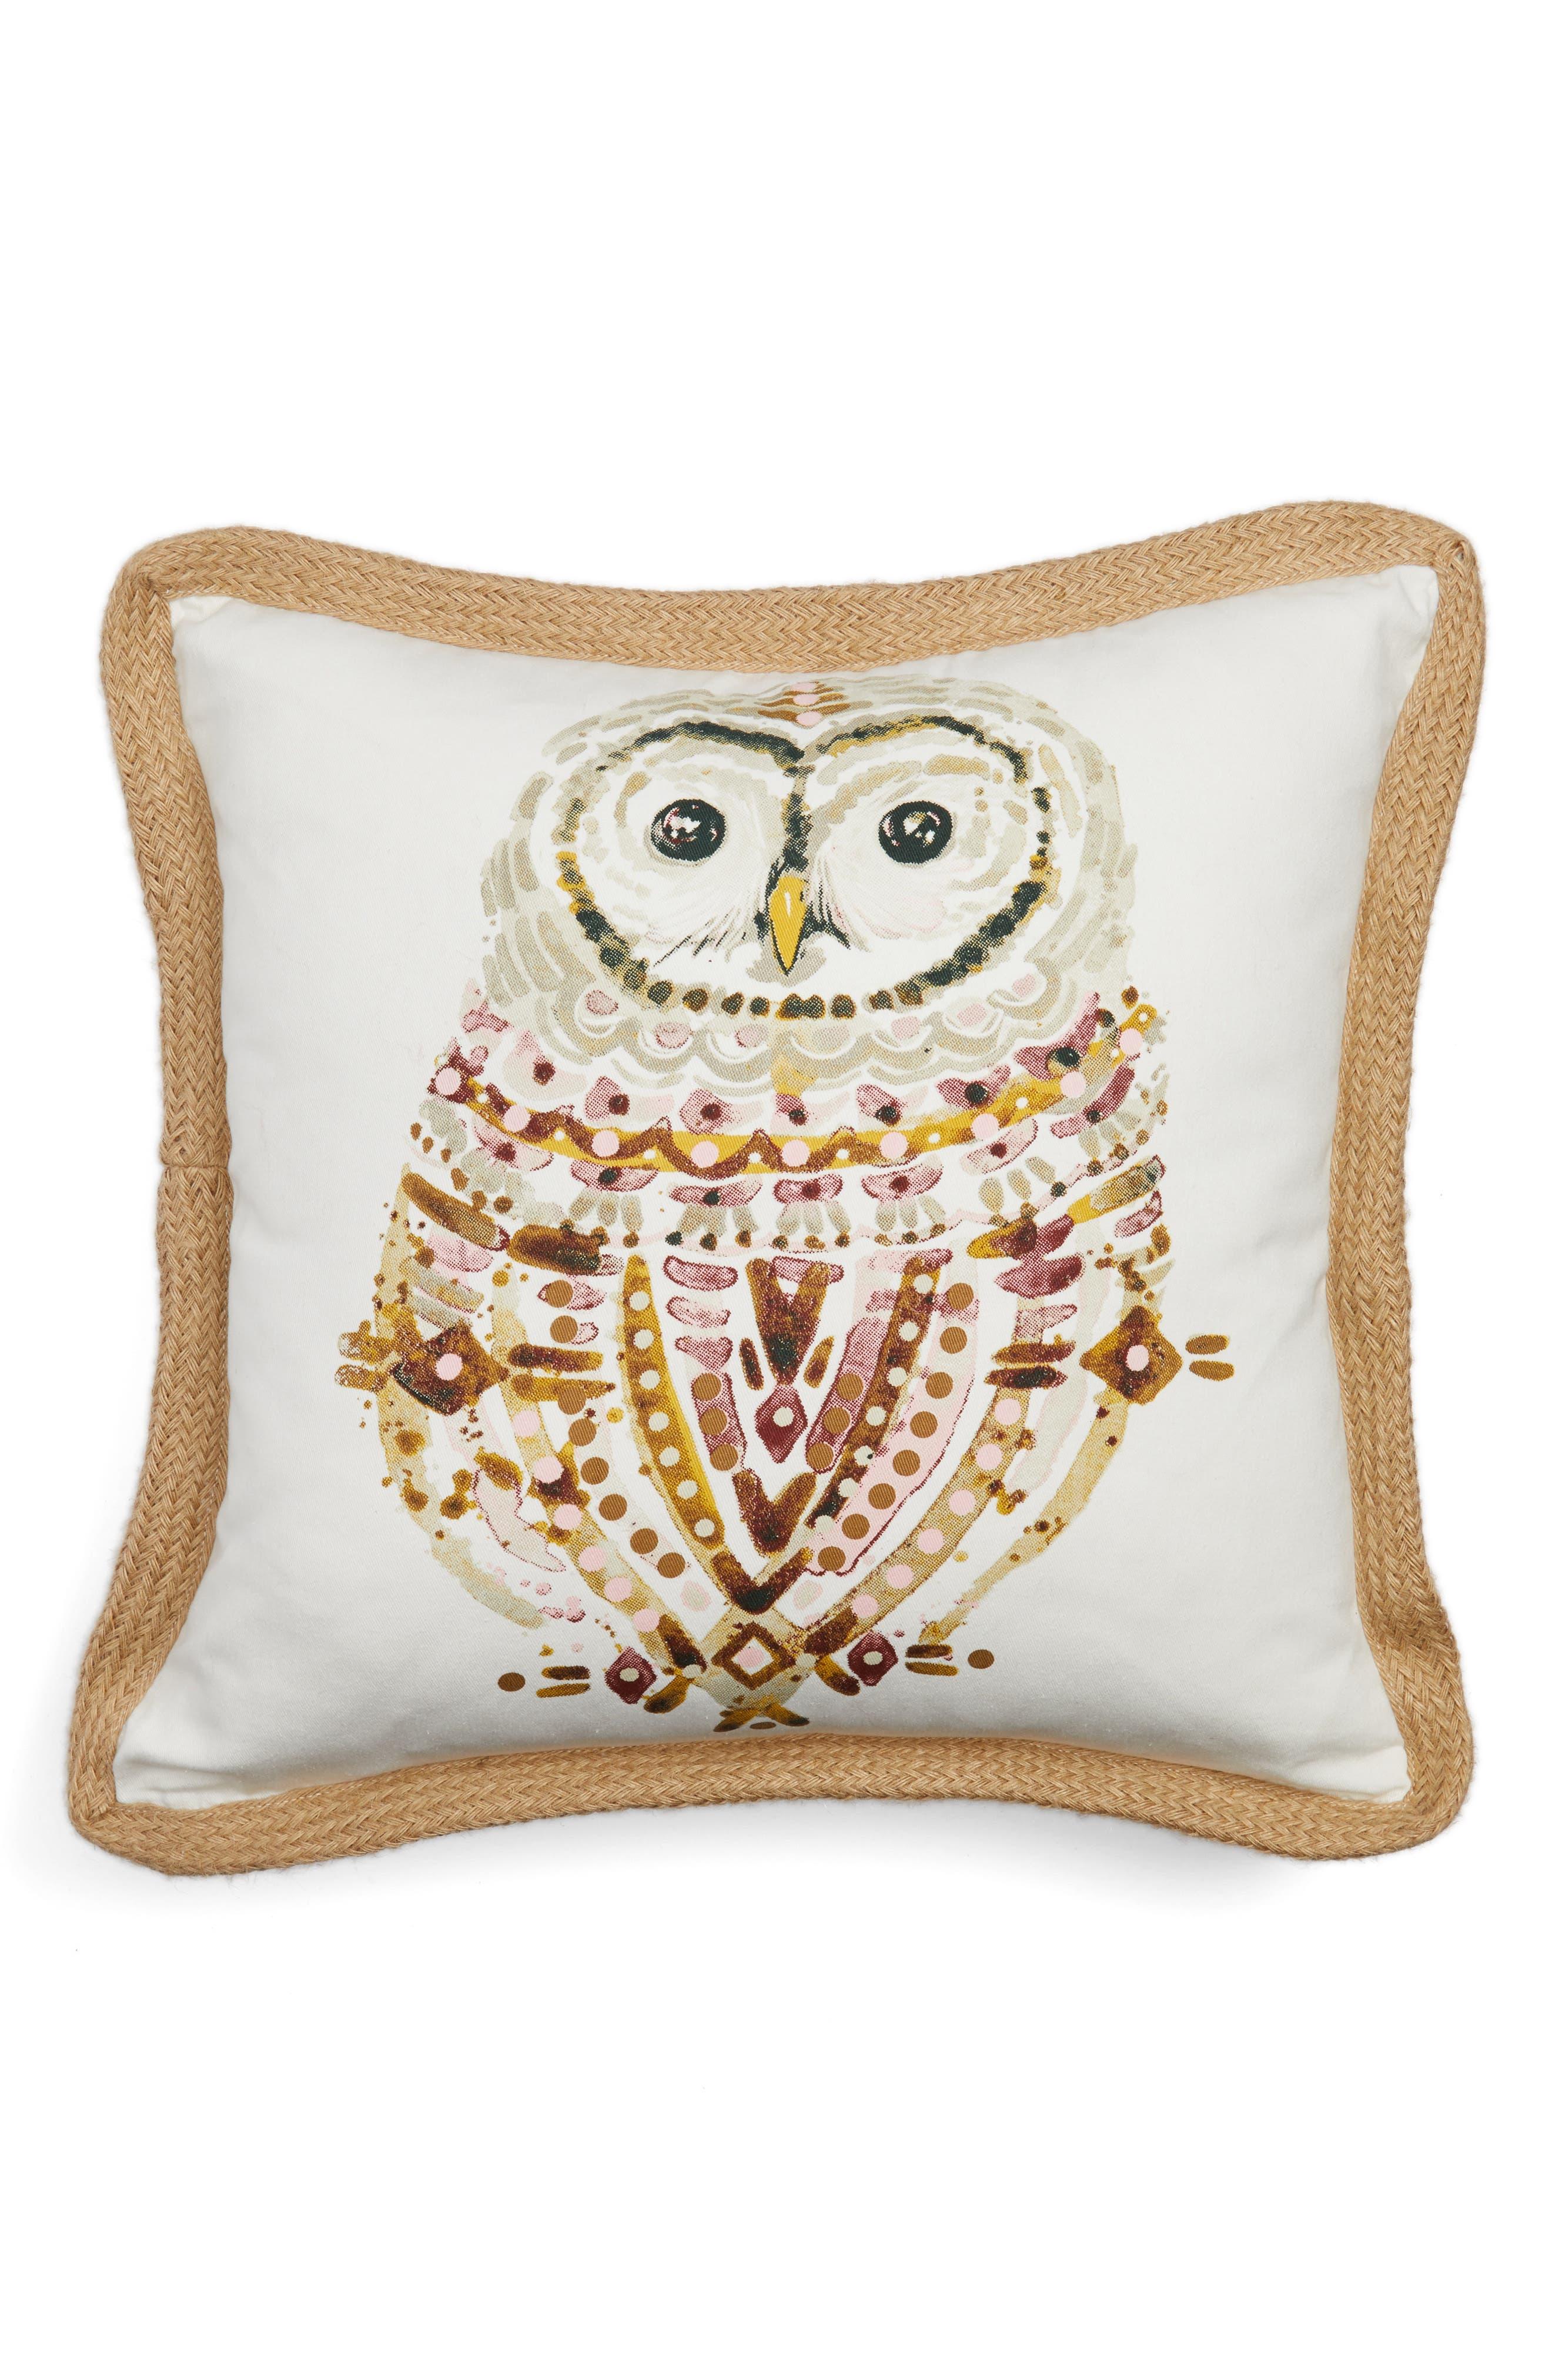 Main Image - Levtex Owl Pillow